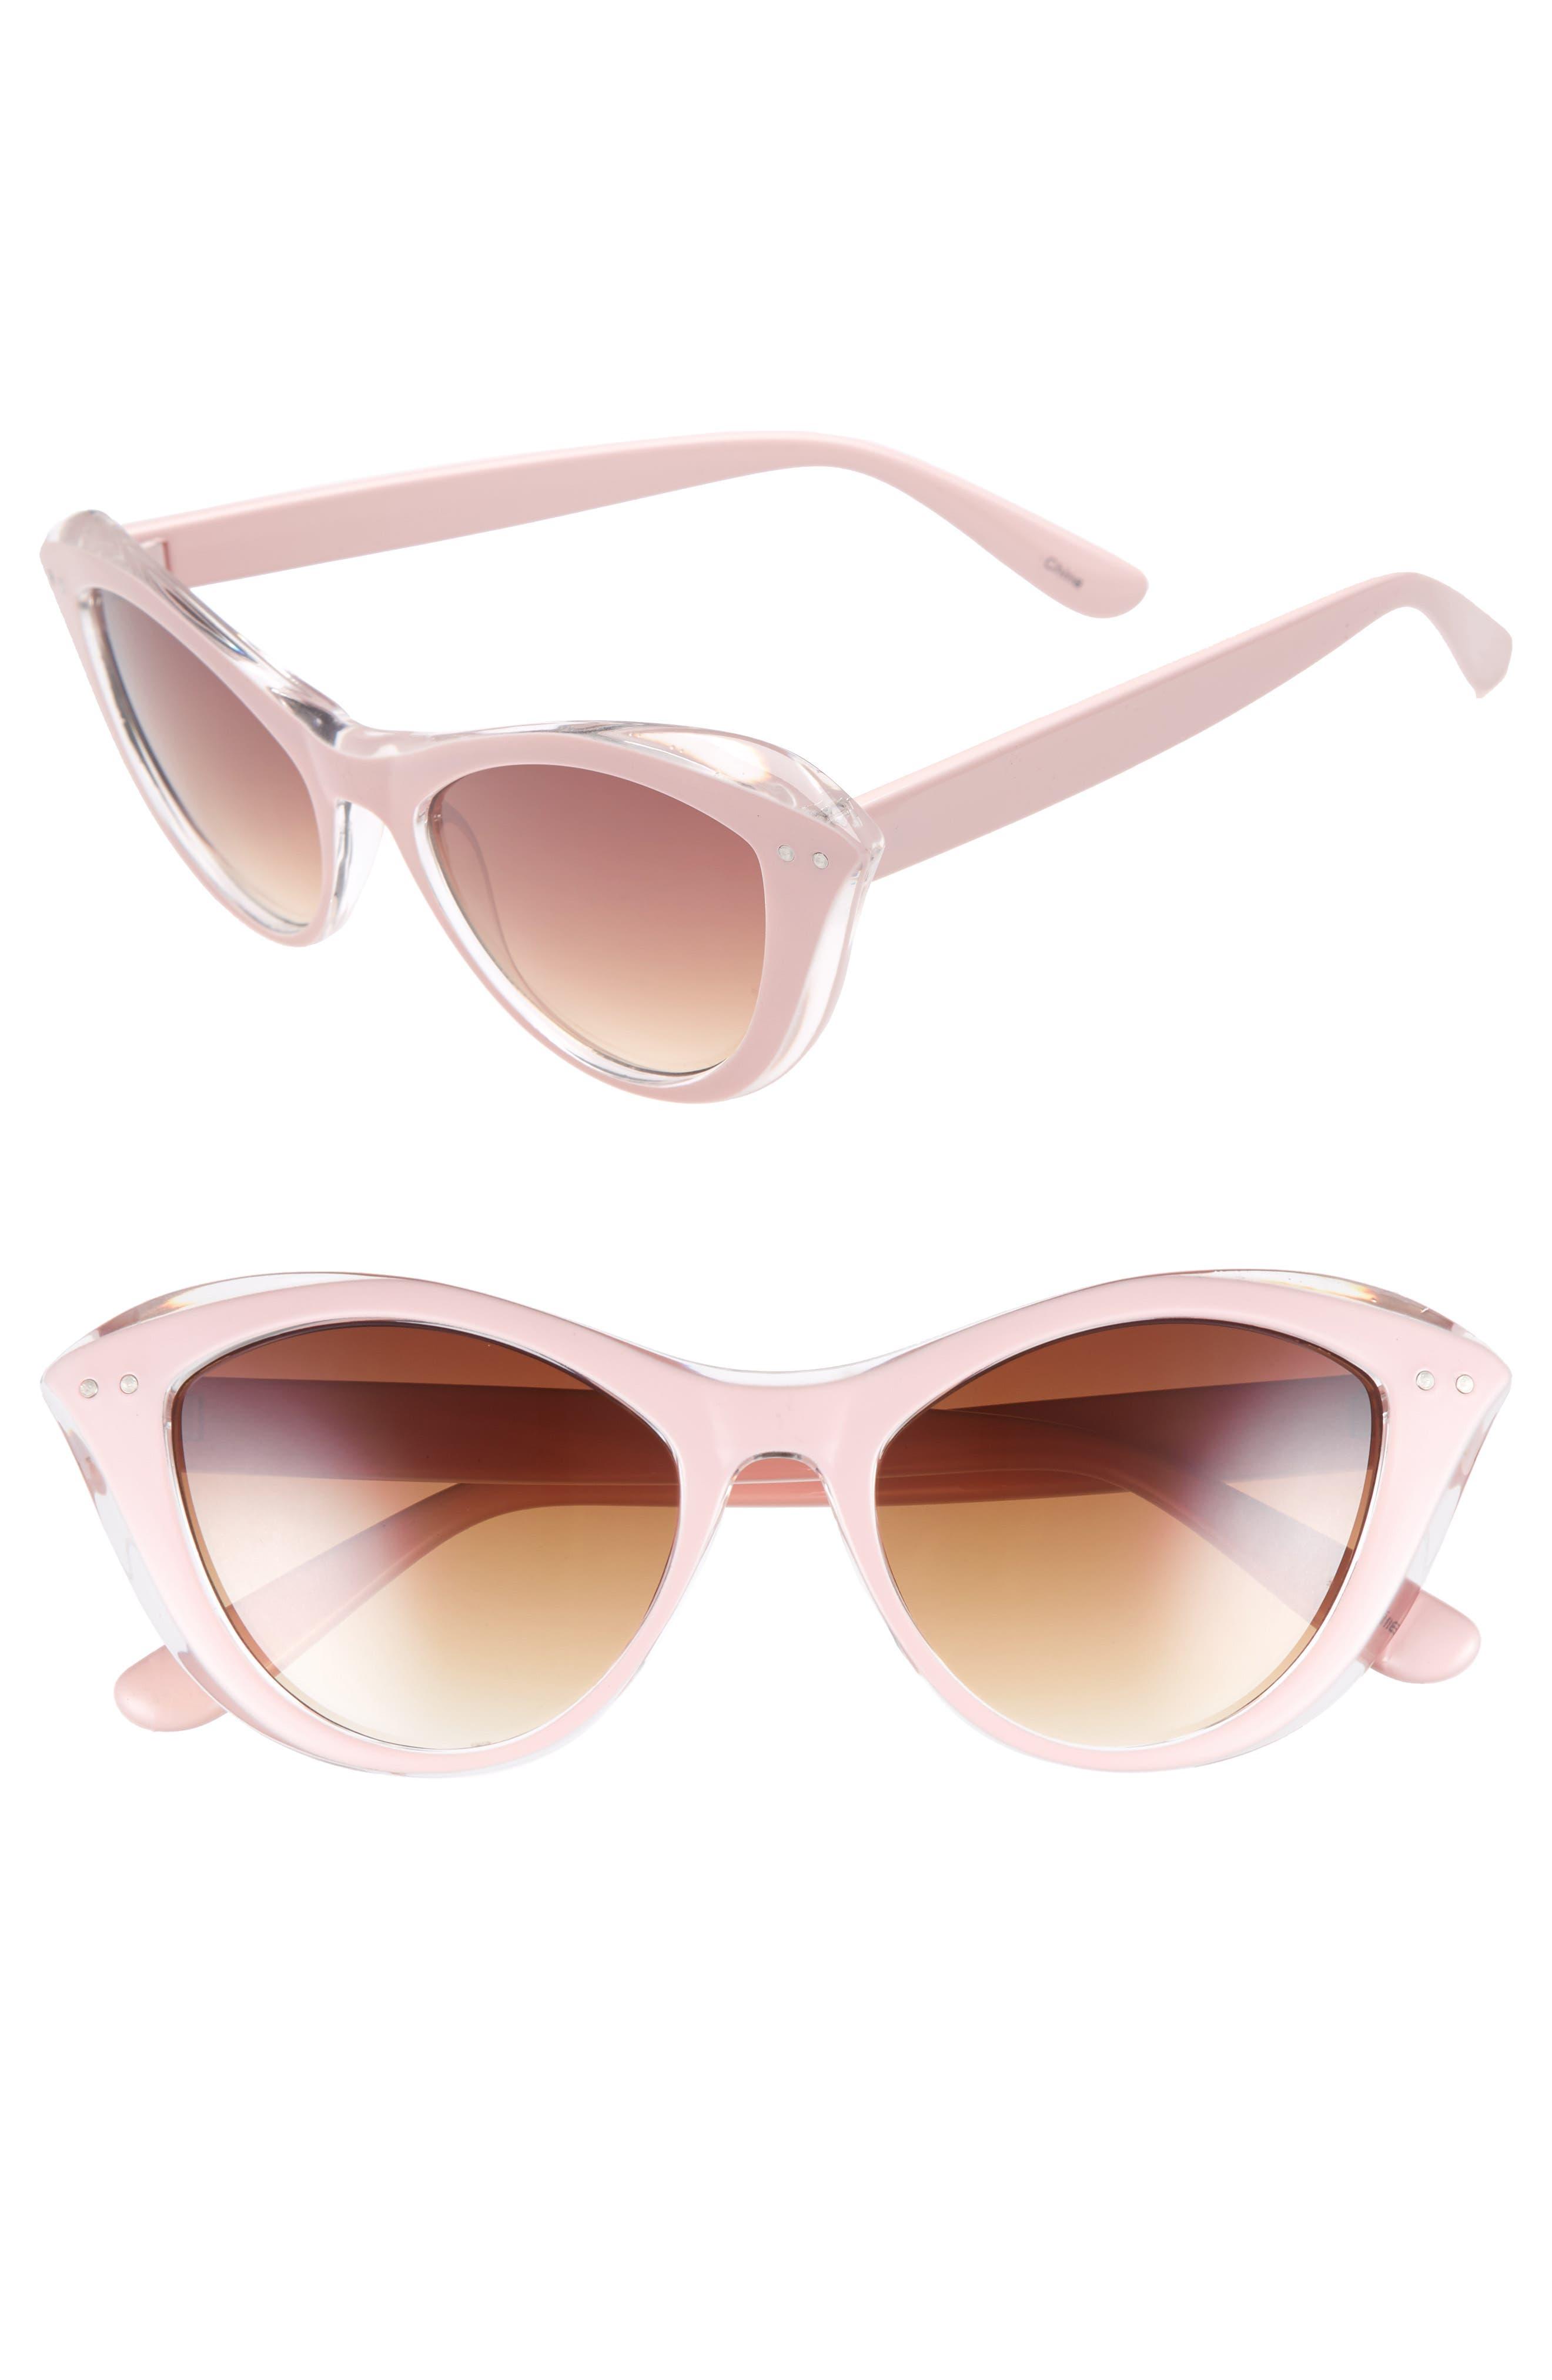 50mm Retro Cat Eye Sunglasses,                         Main,                         color, Pink